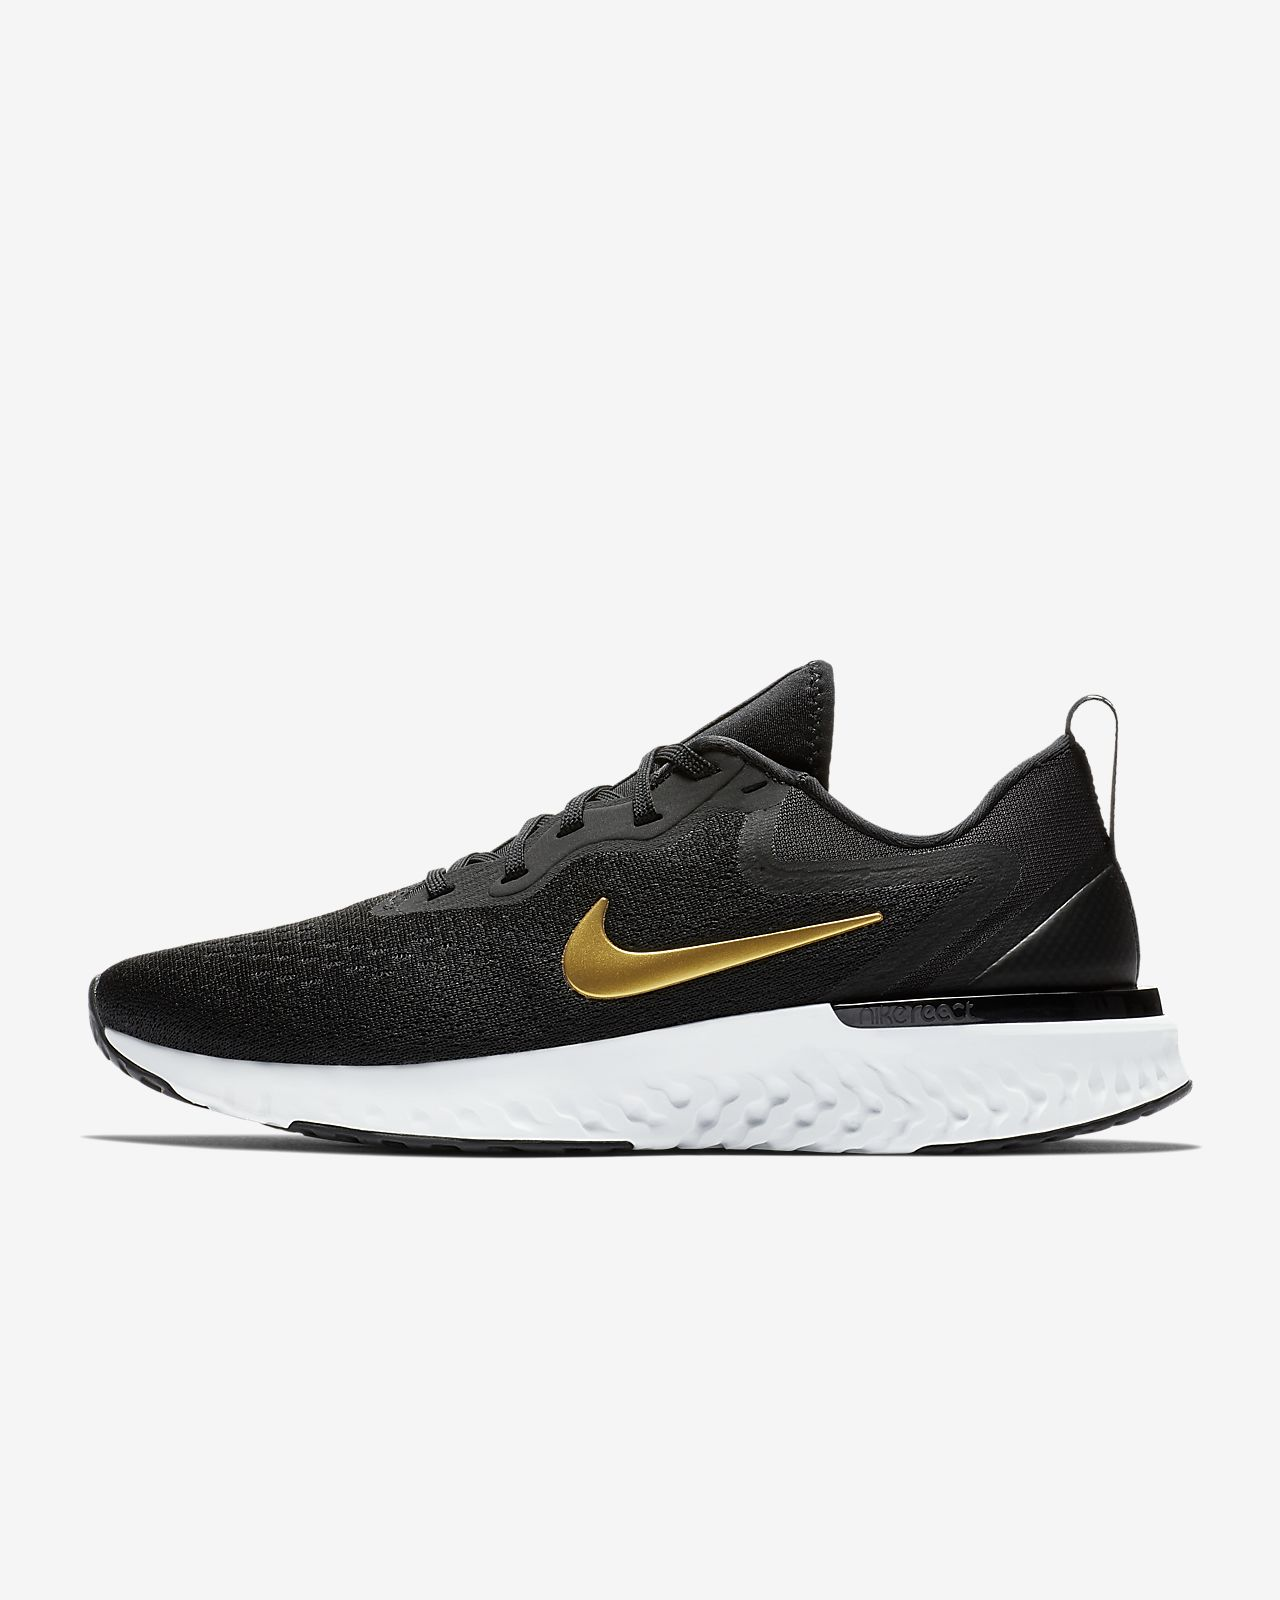 Nike Femme Chaussure Odyssey running React pour de mnwN08